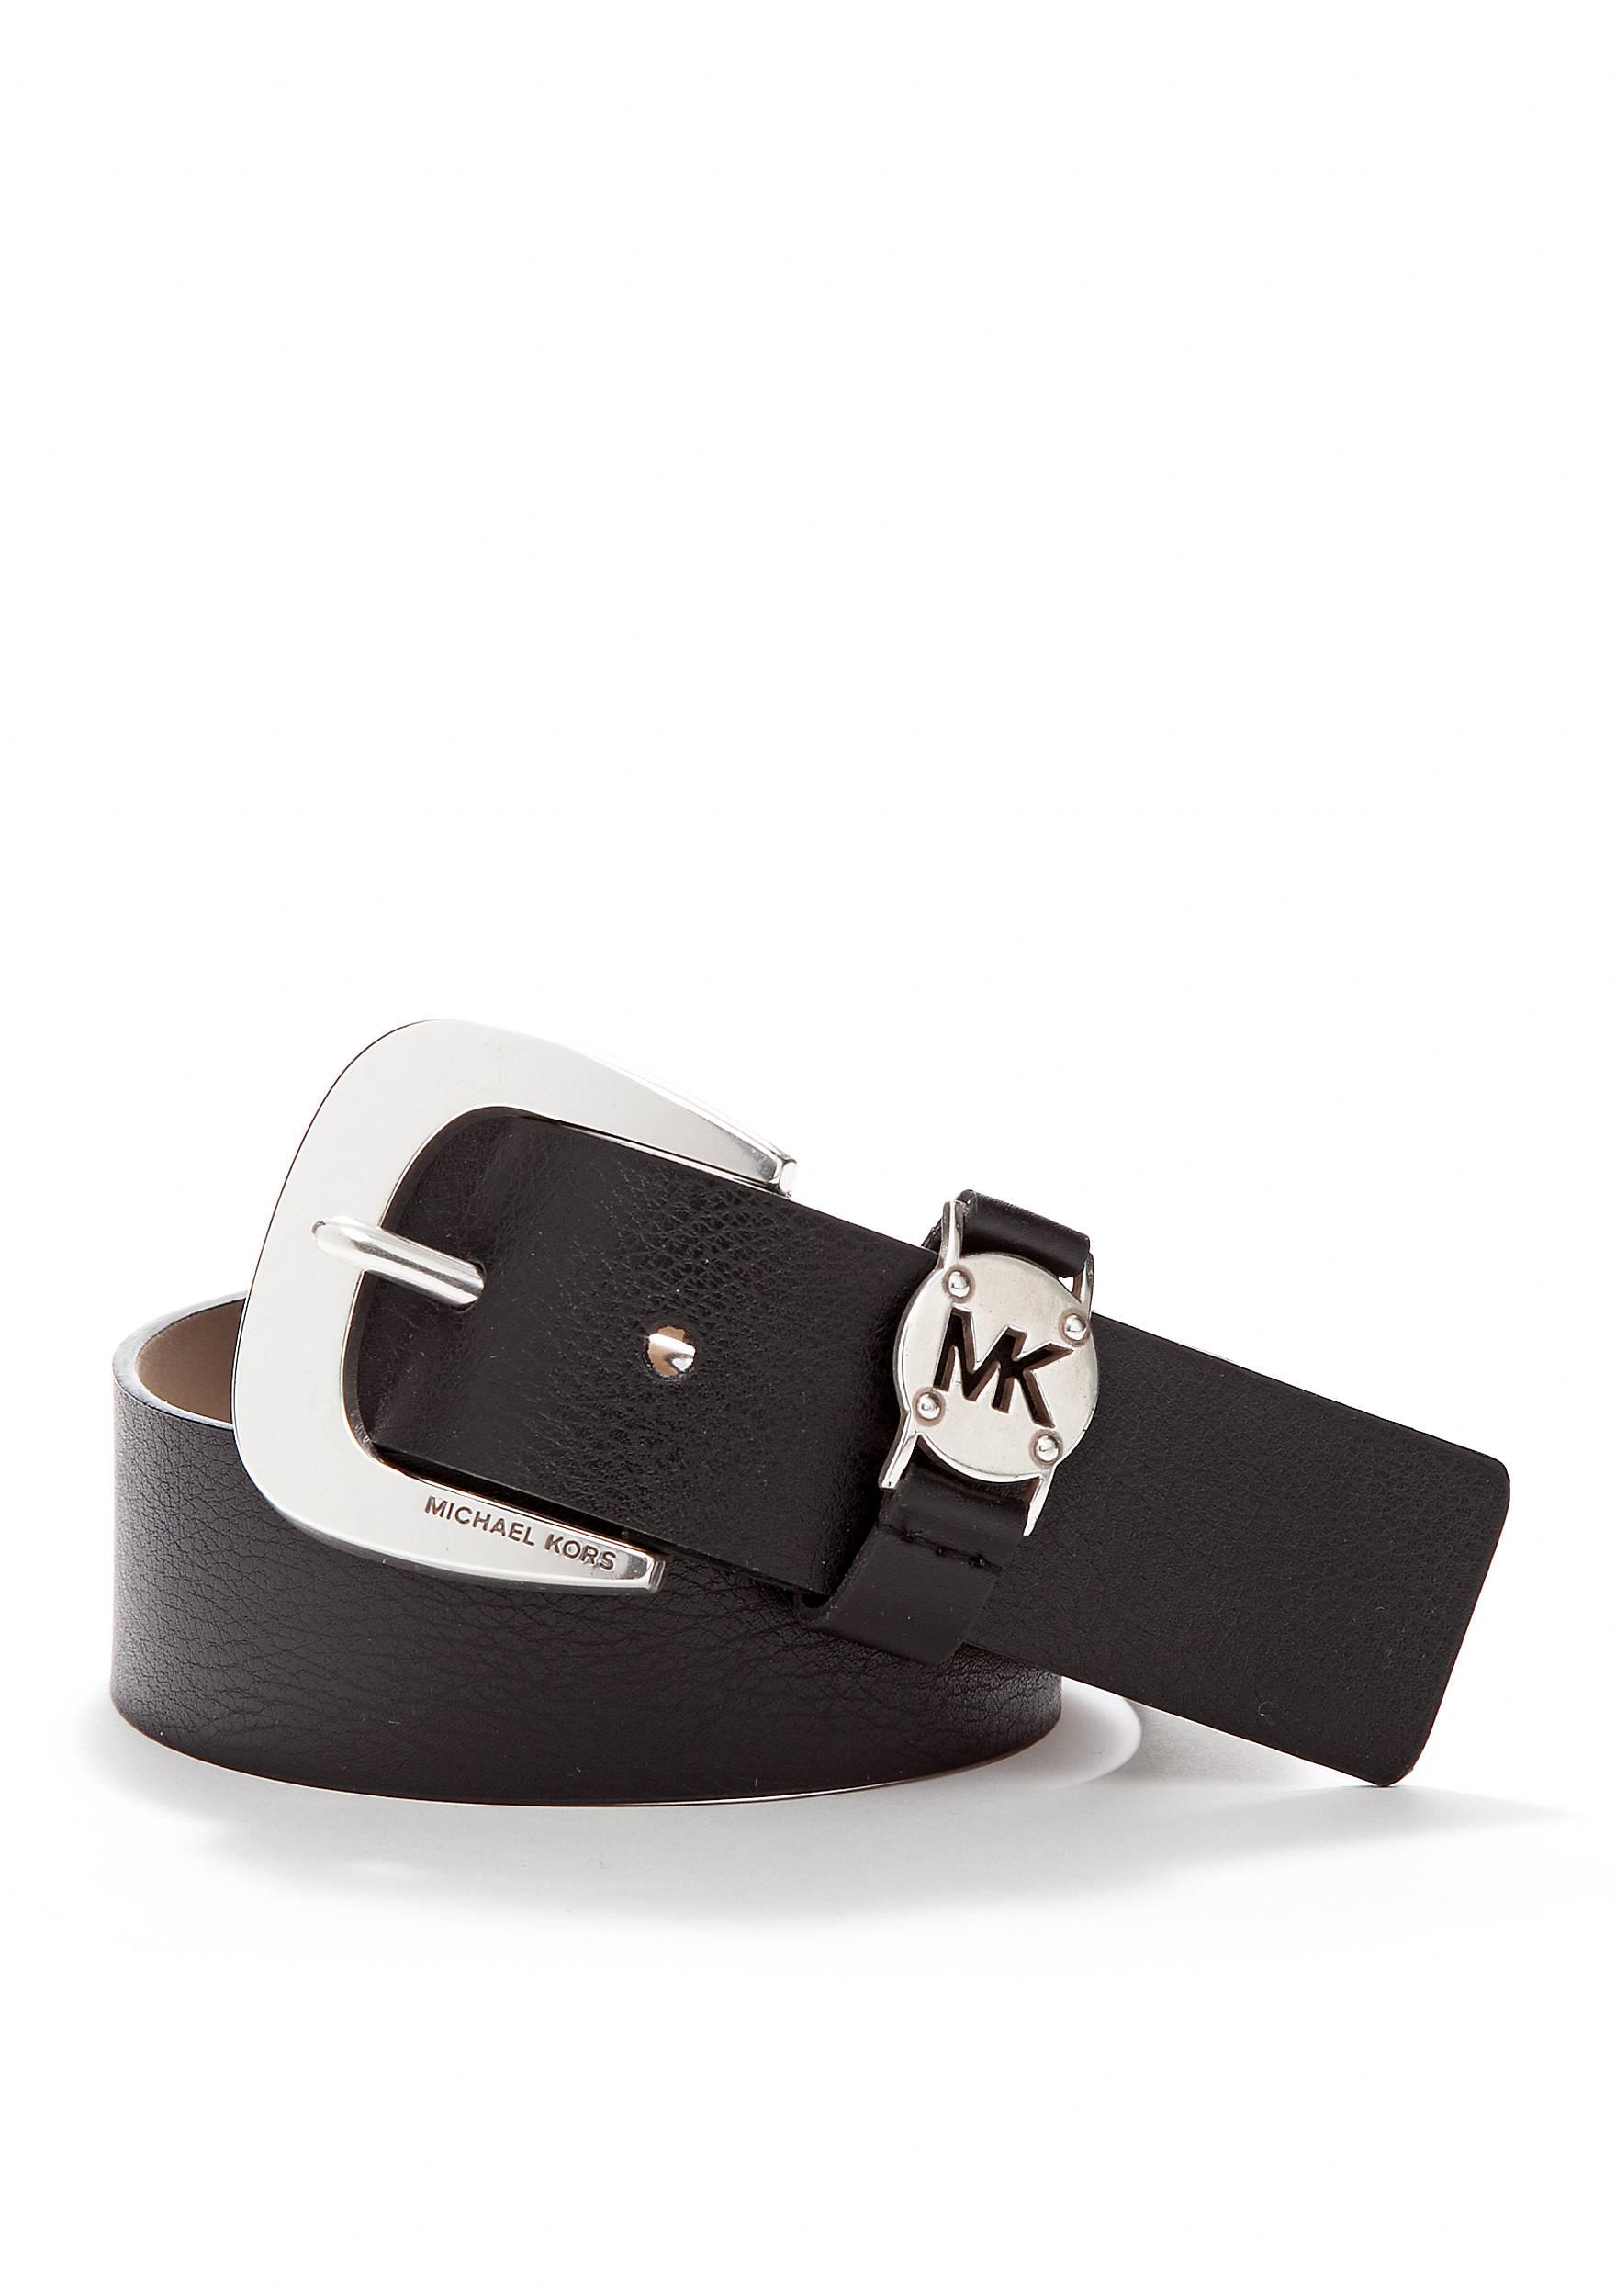 4ece83c875 Michael Kors Belt Bag with Pull Chain · Michael Kors Leather Logo Belt